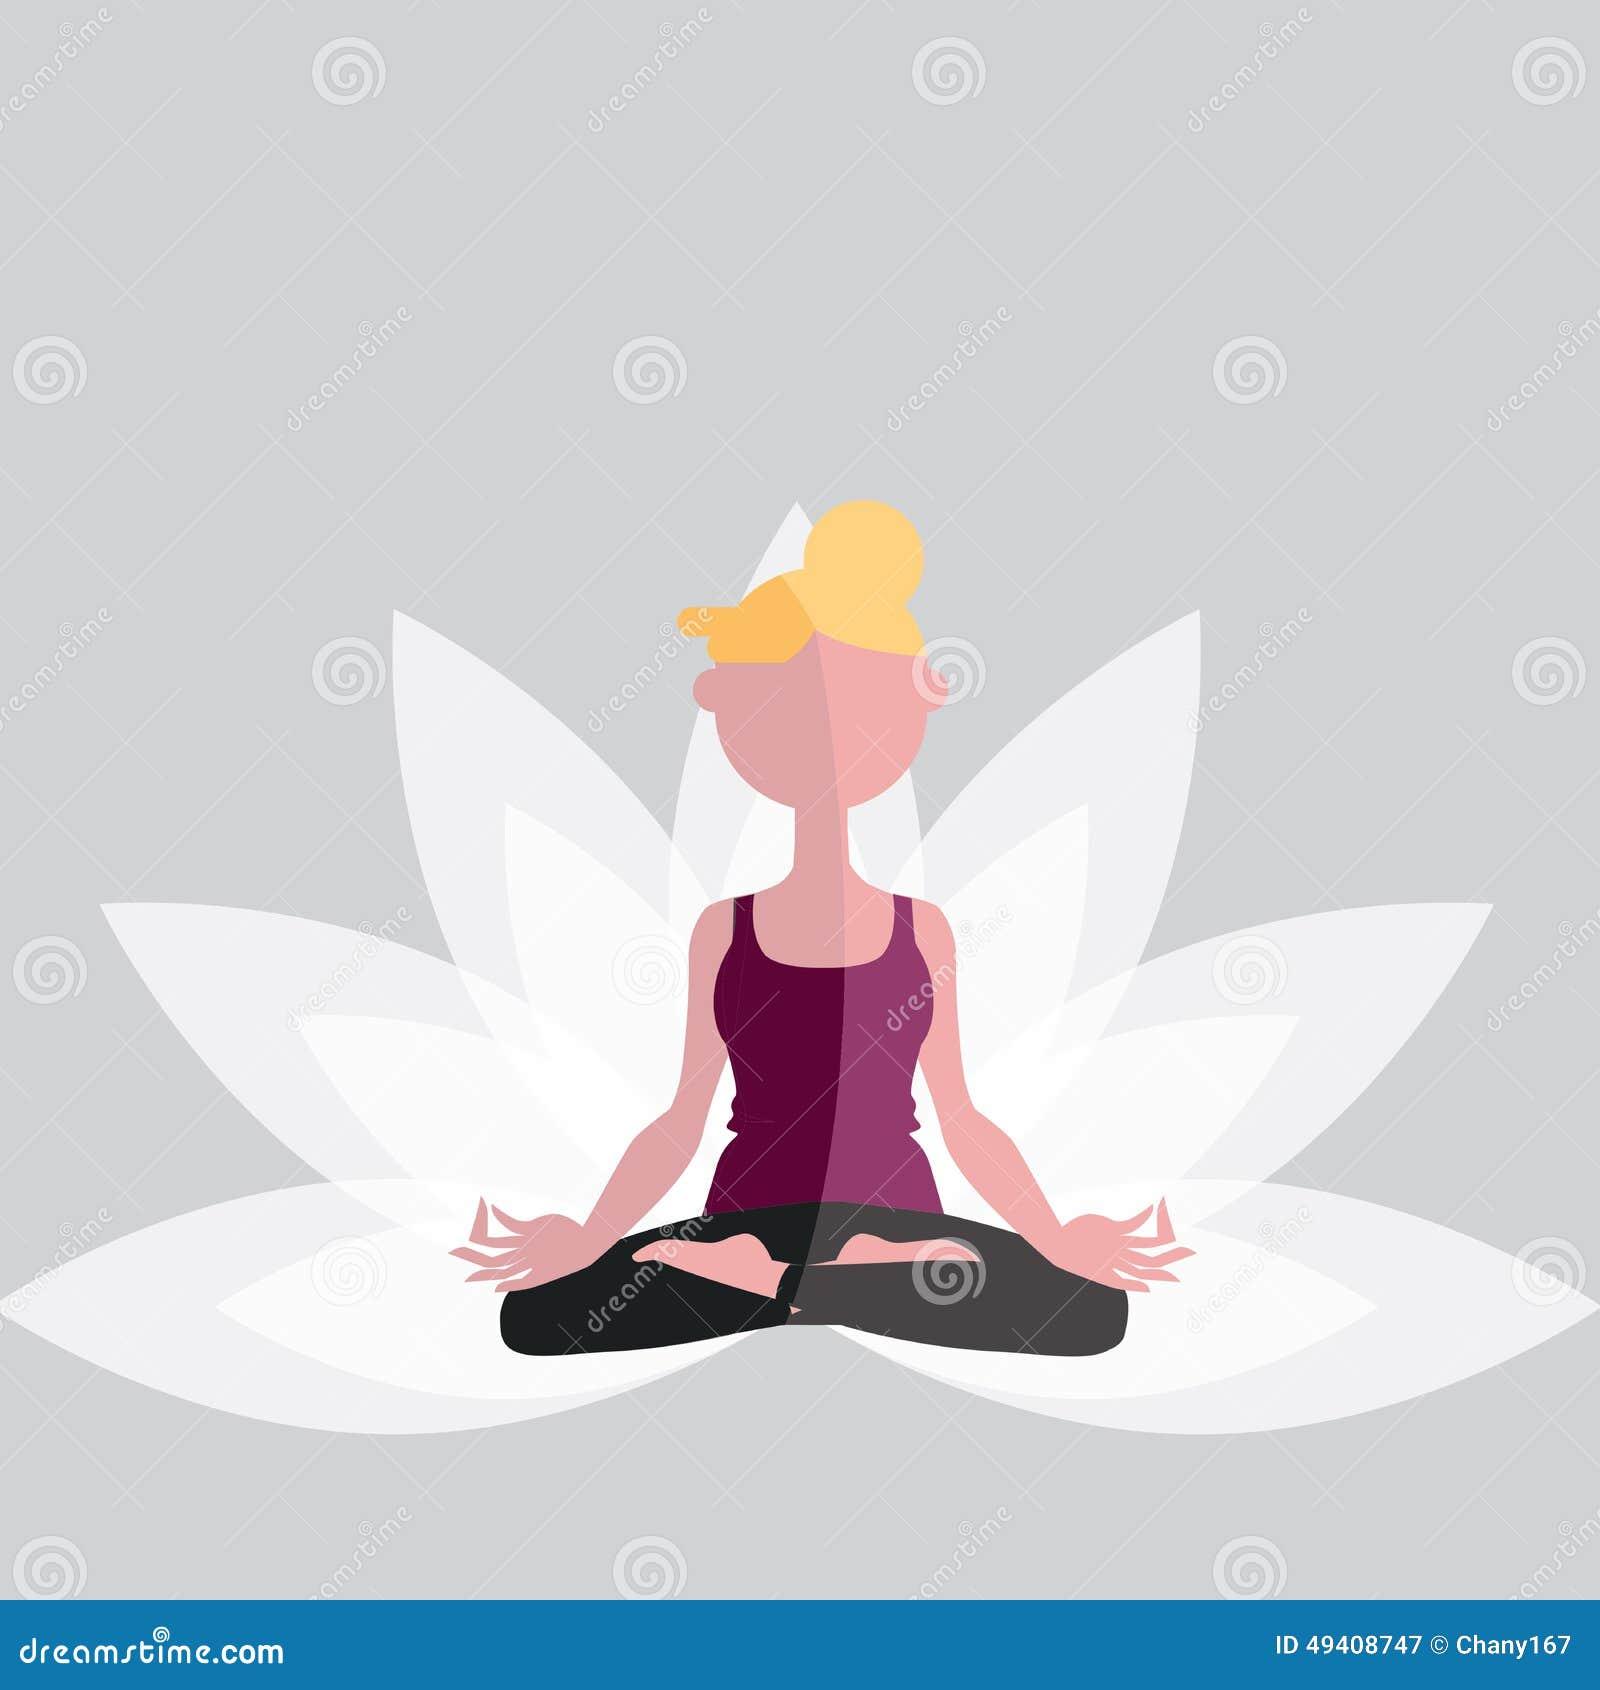 Download Yoga stock abbildung. Illustration von meditation, karosserie - 49408747